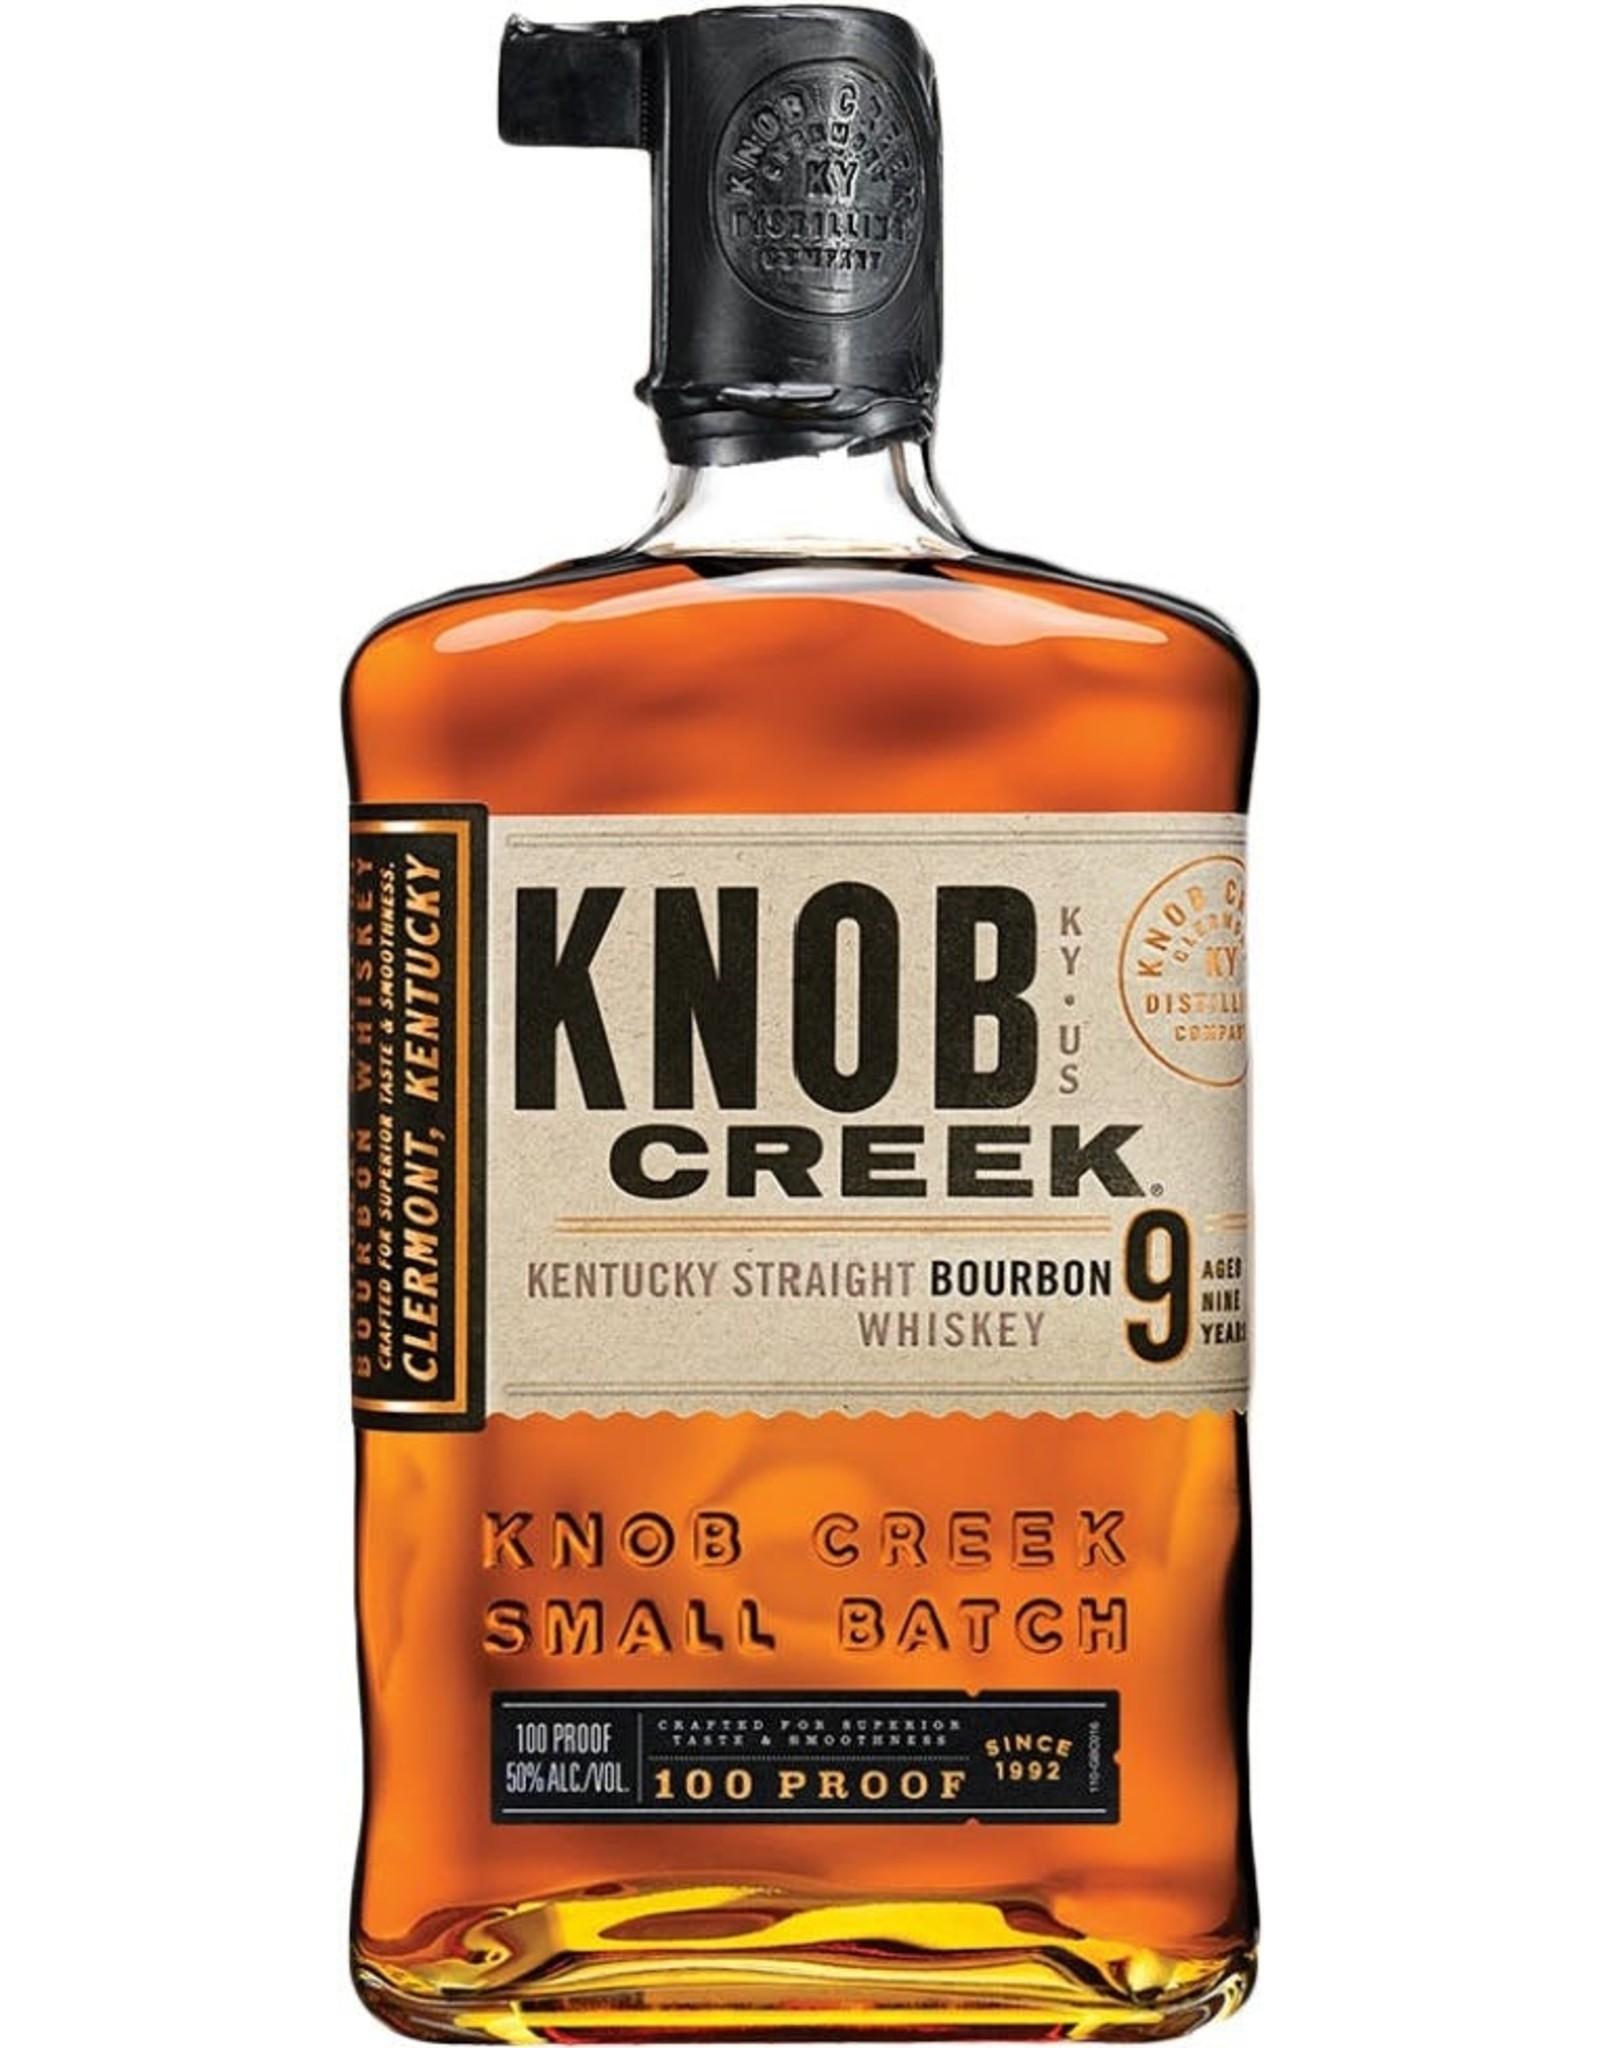 Knob Creek 9 Year Kentucky Straight Bourbon liter